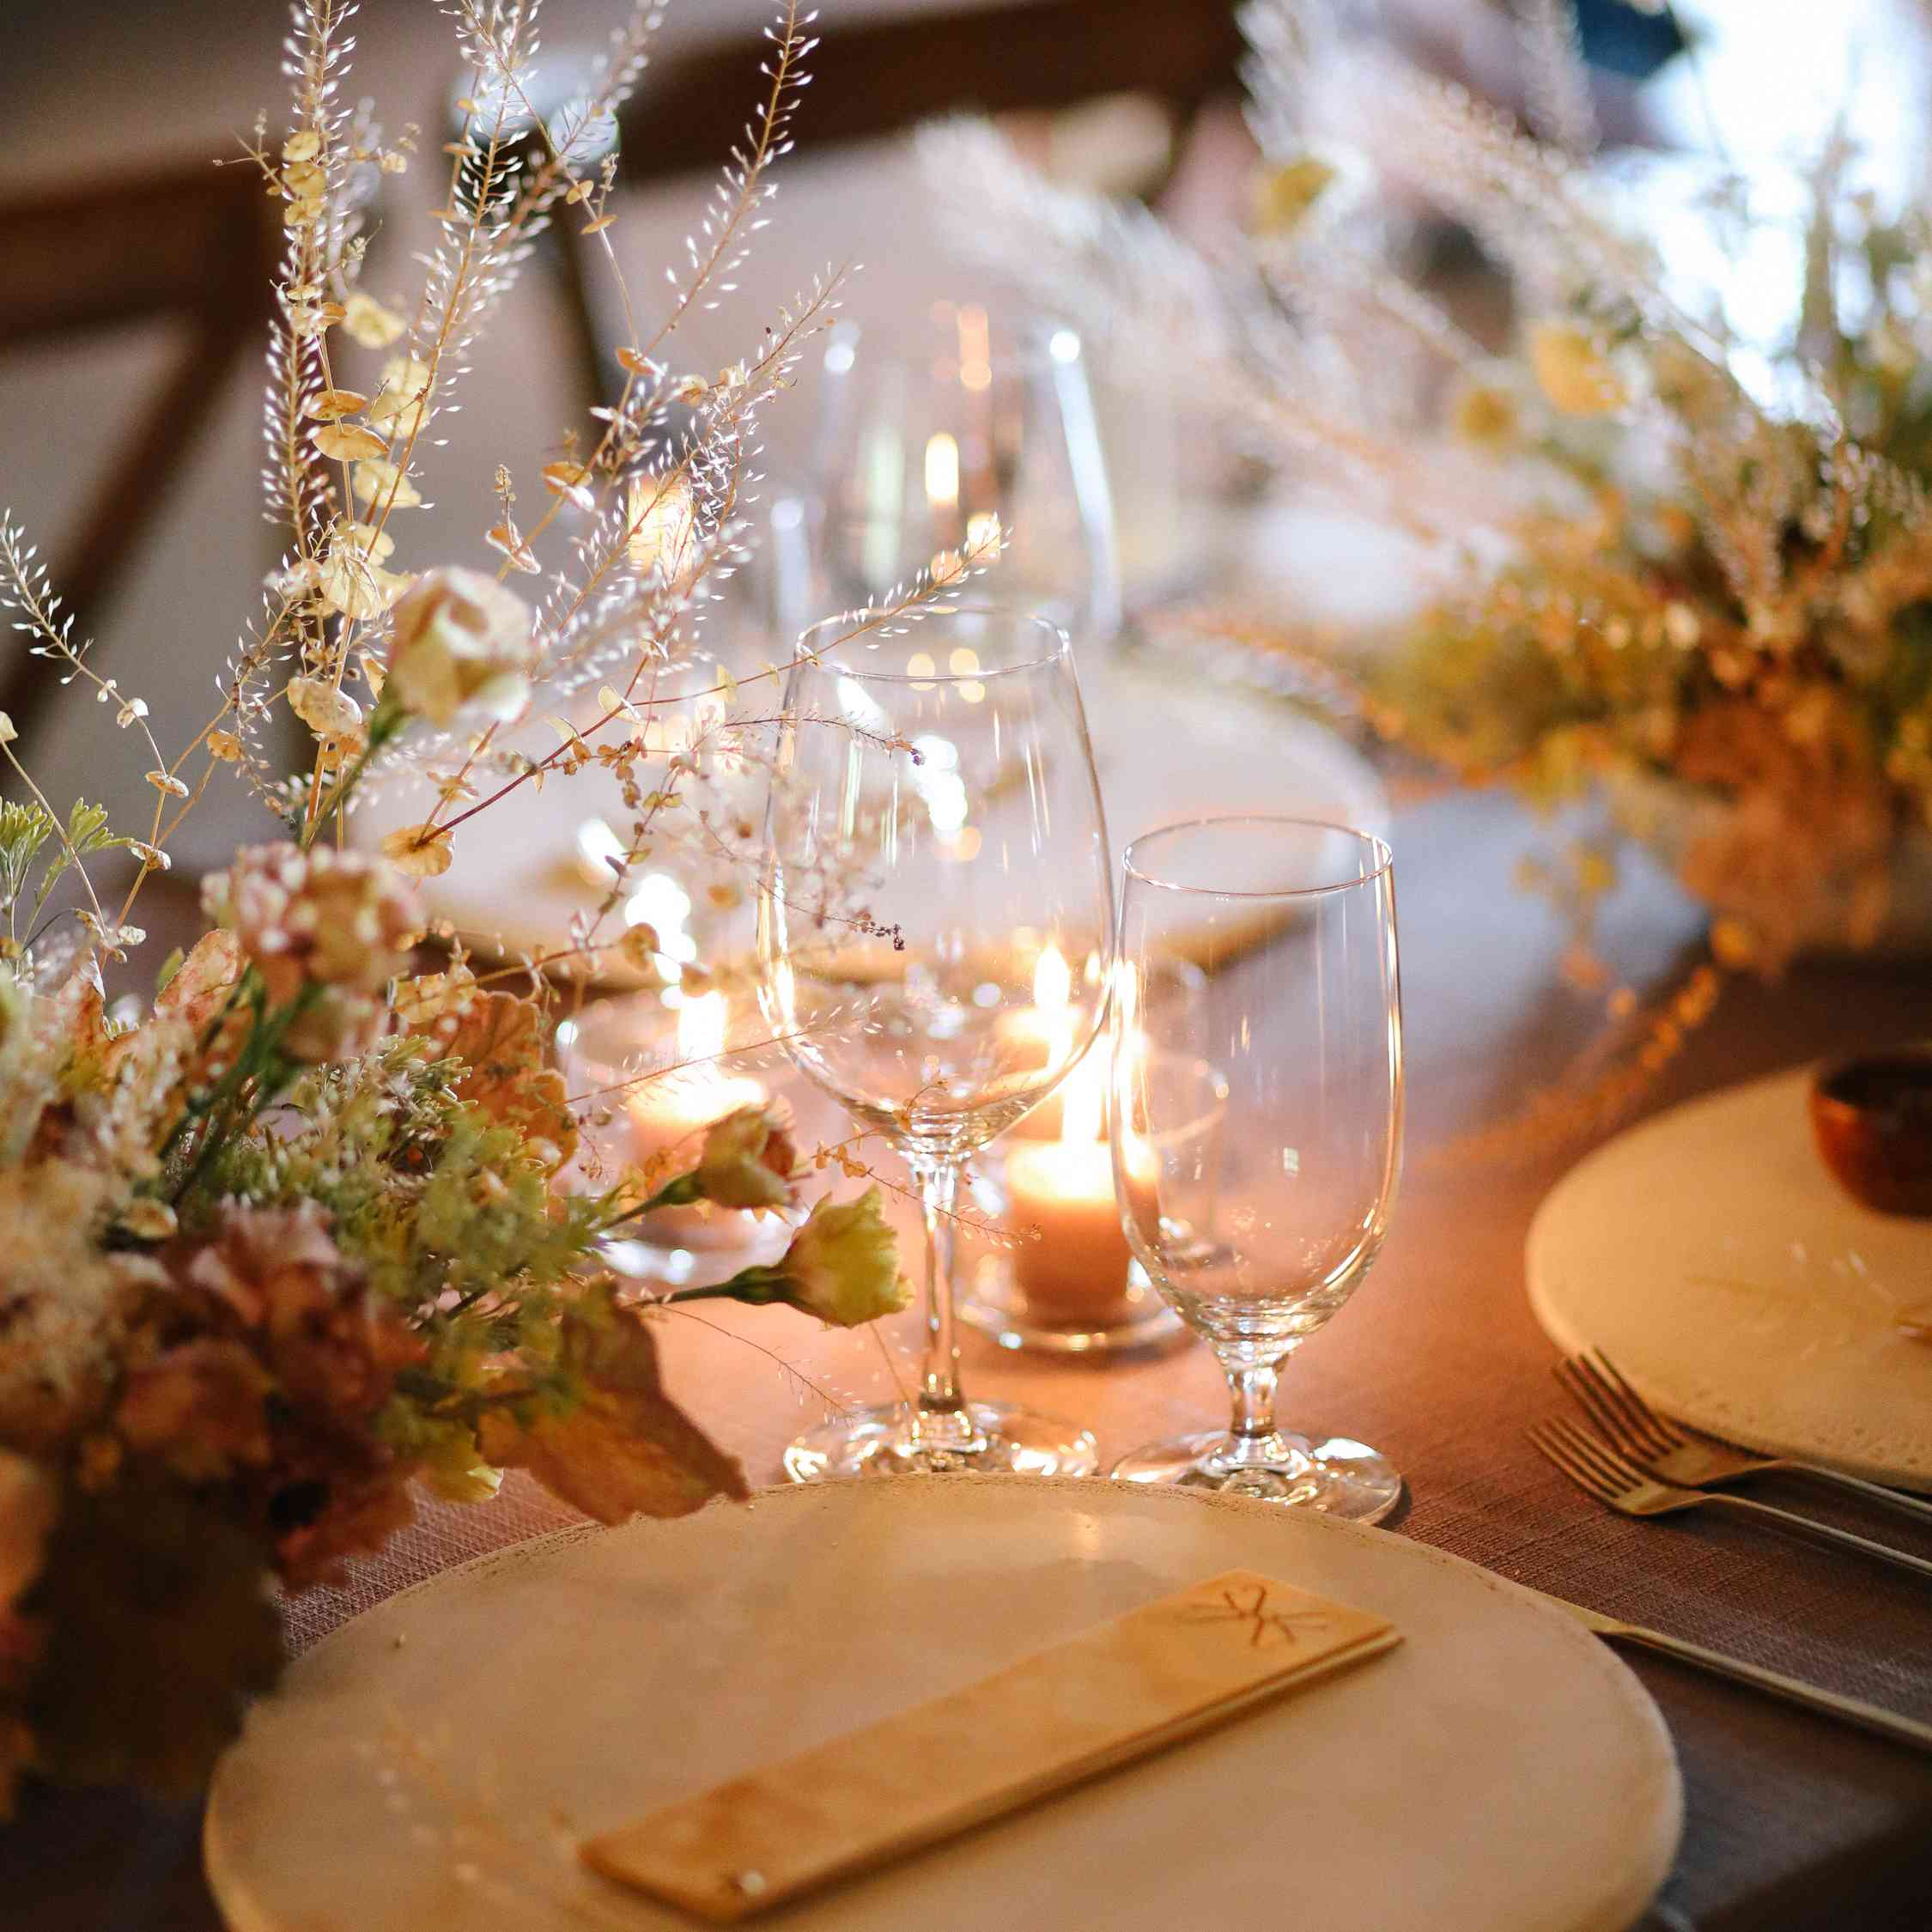 savannah and riker wedding, table setting